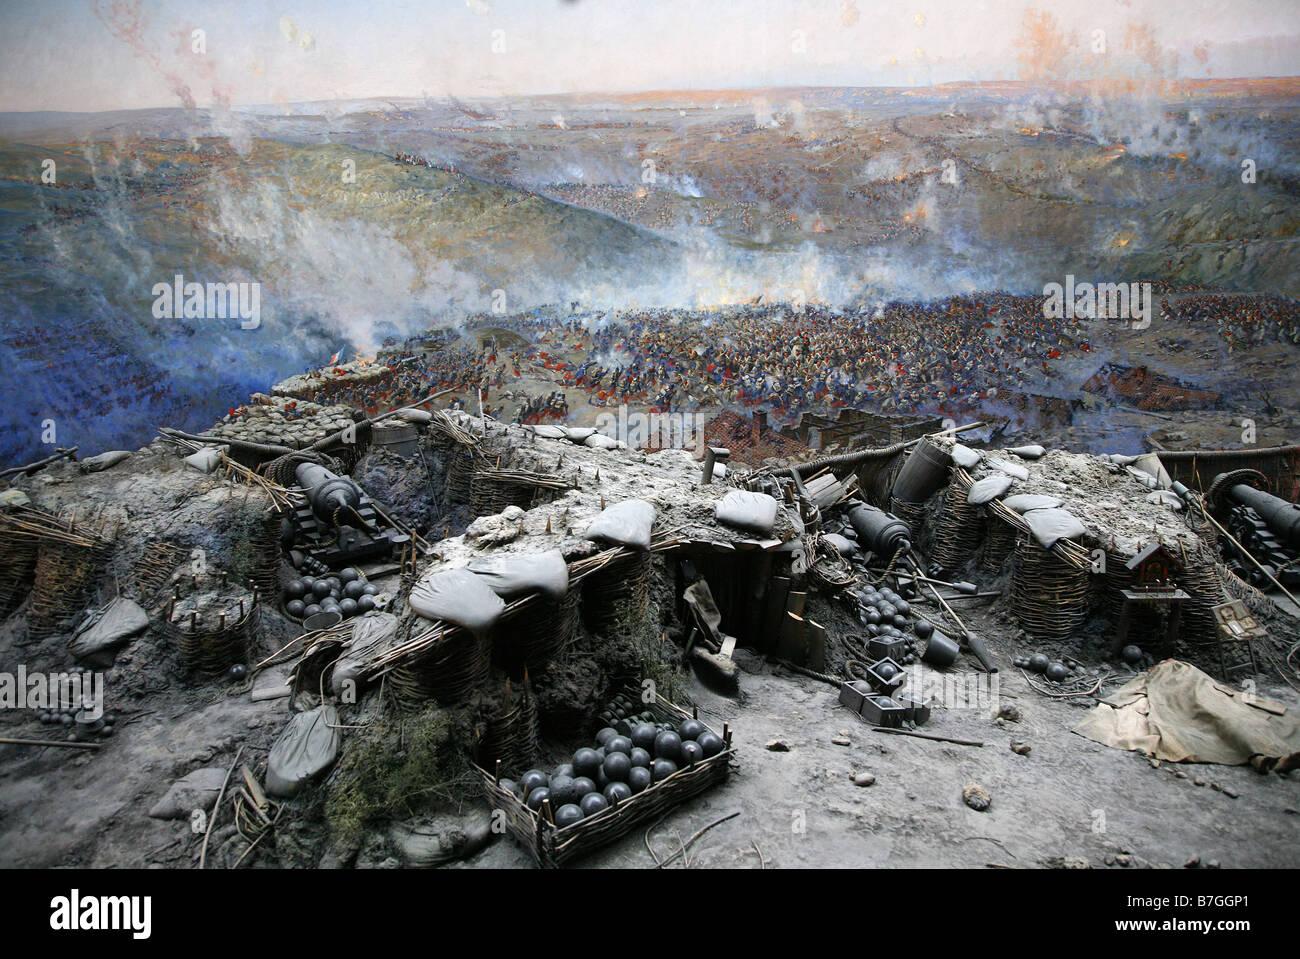 PANORAMA BUILDING PAINTING SEVASTOPOL UKRAINE SEVASTOPOL CRIMEA UKRAINE 29 April 2008 - Stock Image